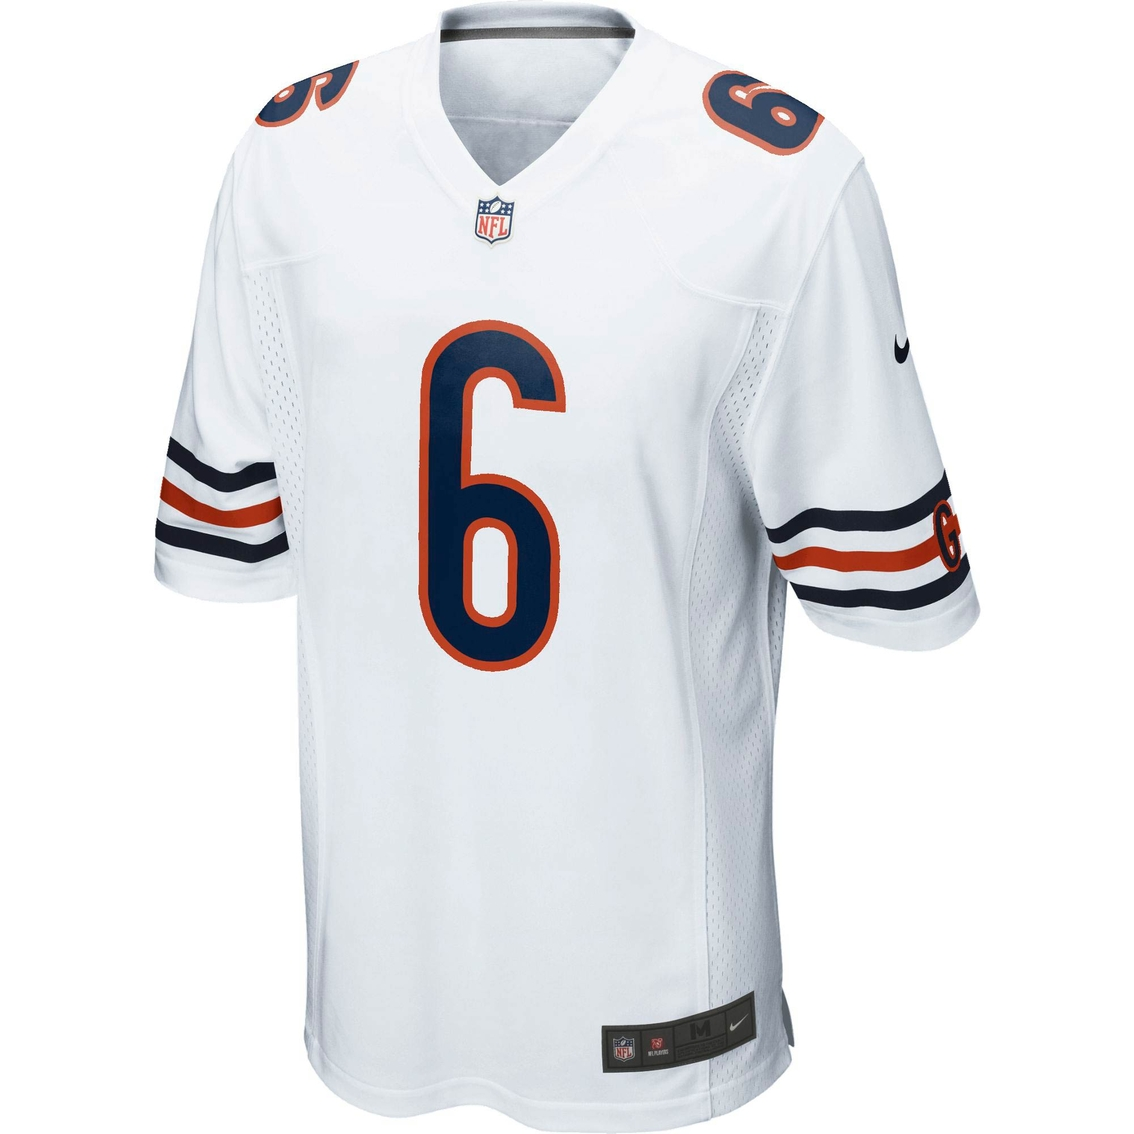 2dcbf6cc925 Nike Nfl Chicago Bears Men's Jay Cutler White Game Jersey   Jerseys ...